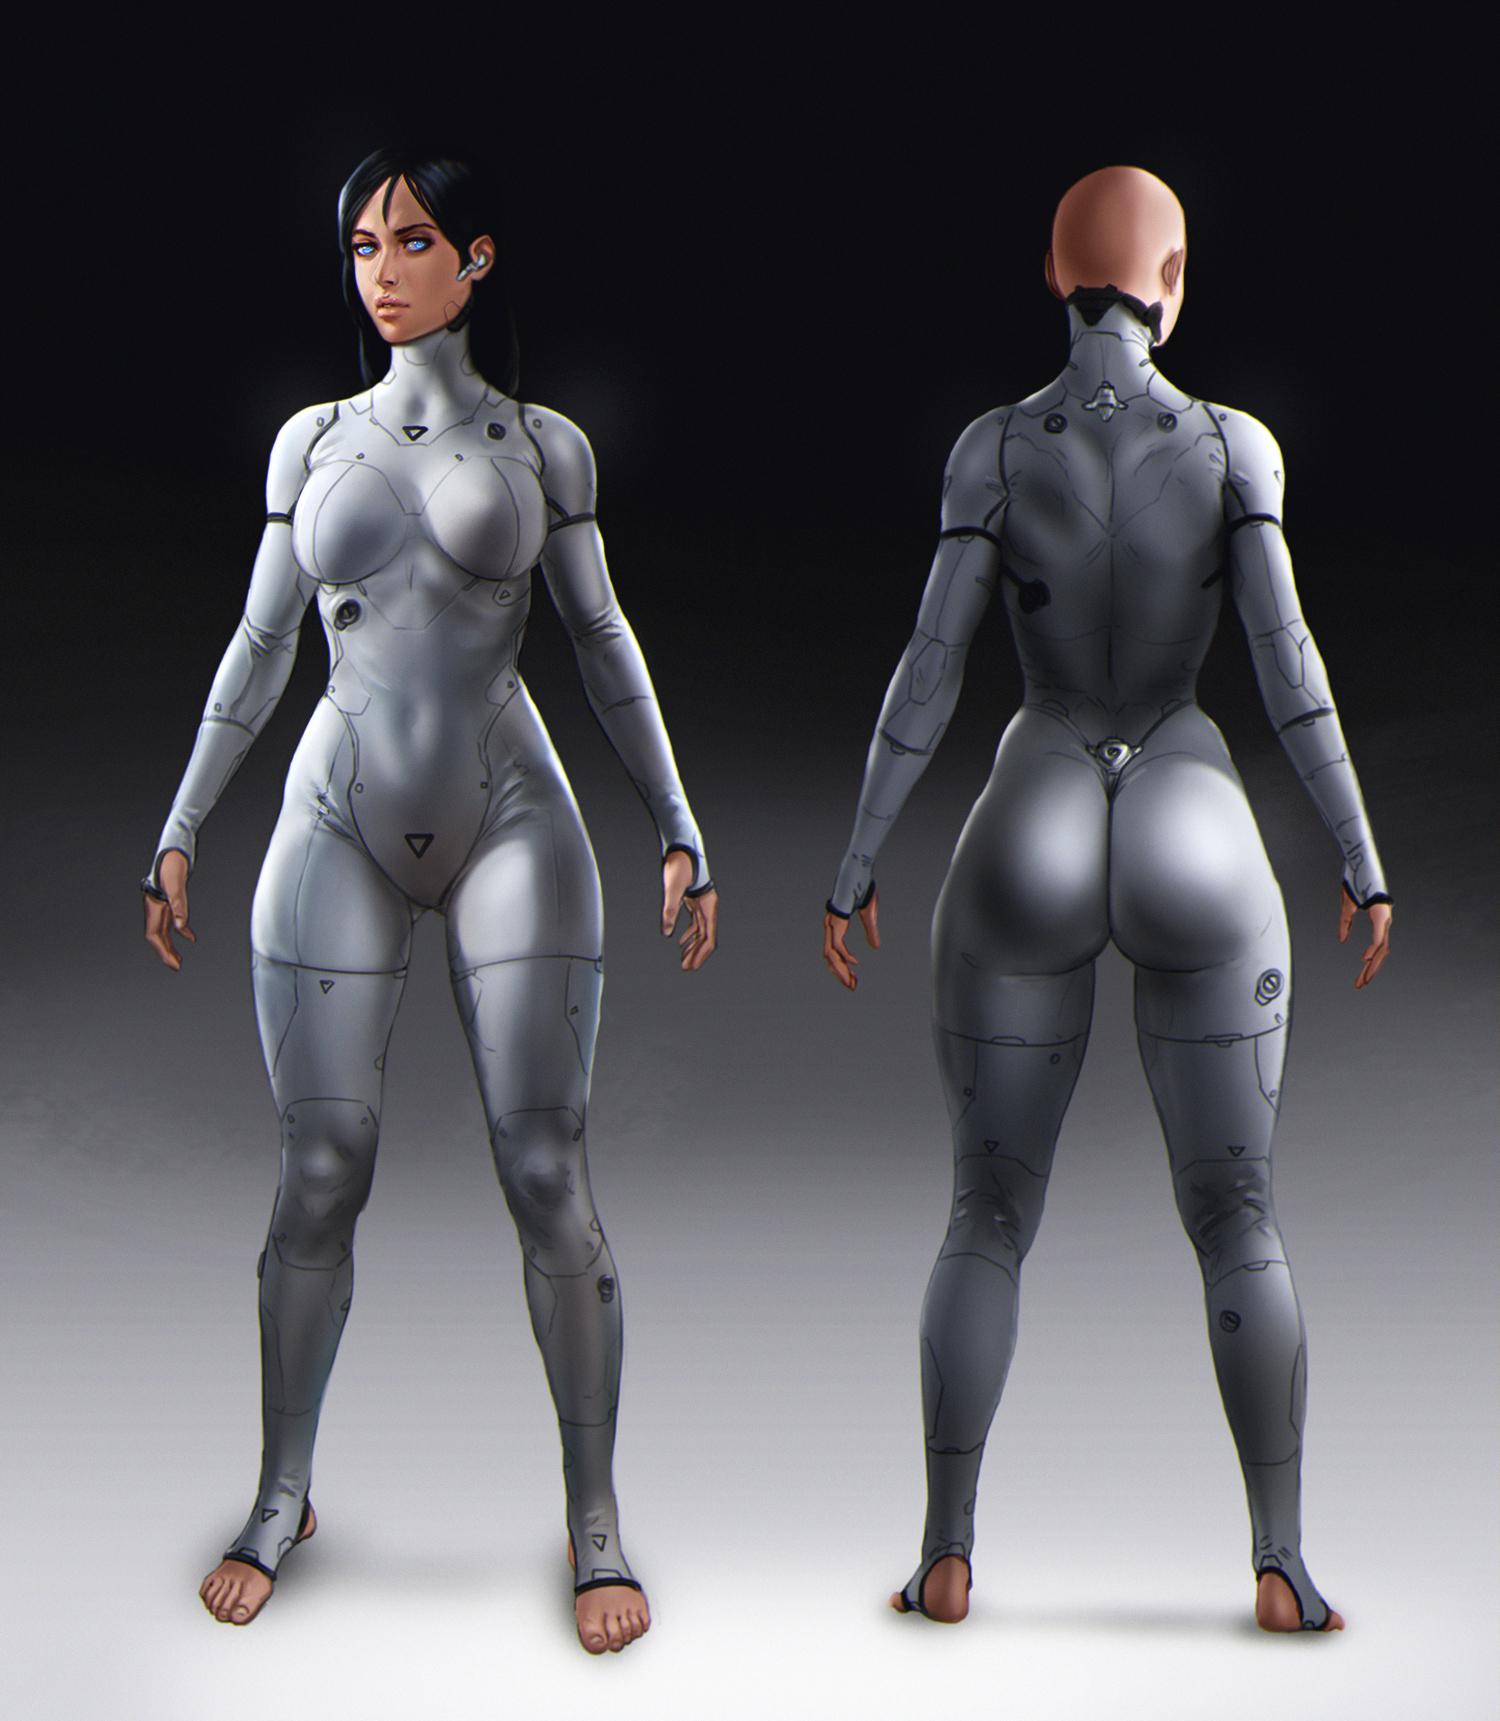 Character/Suit Design